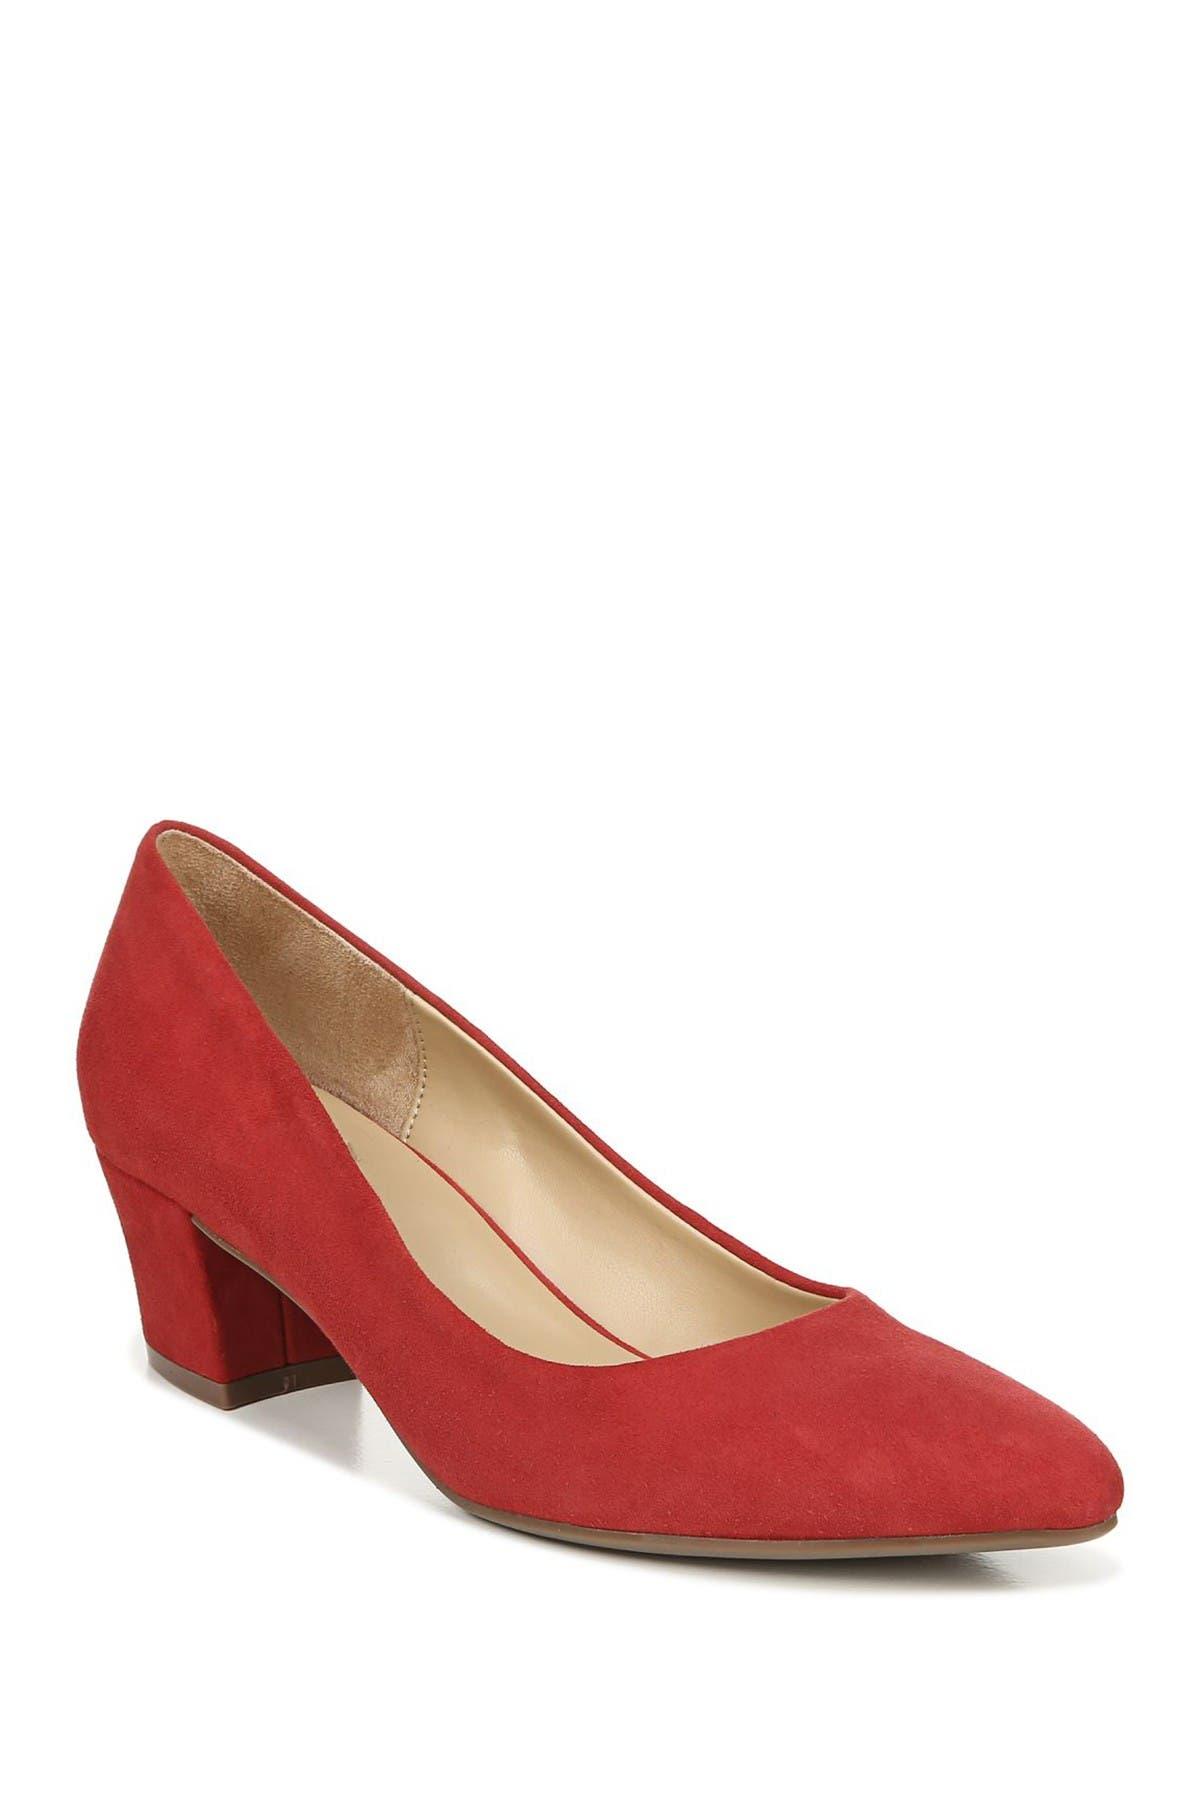 Image of Naturalizer Carmen Suede Block Heel Pump - Wide Width Available